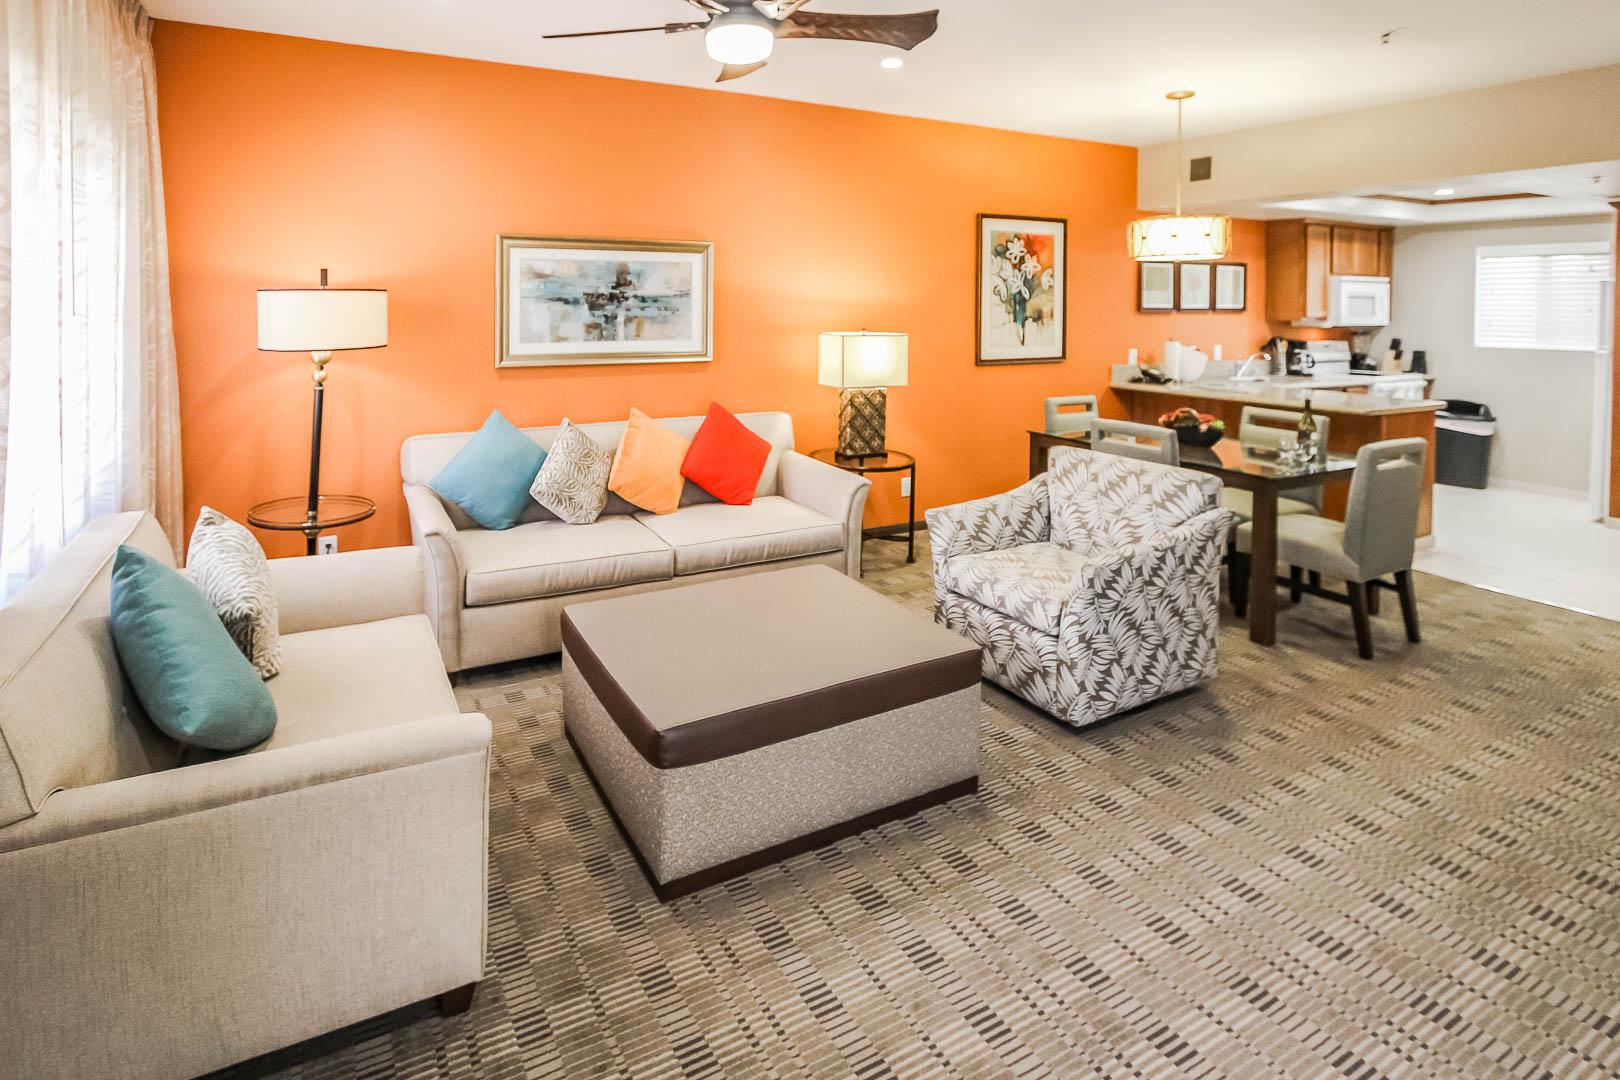 An expansive living room area at VRI's Desert Isle Resort in California.